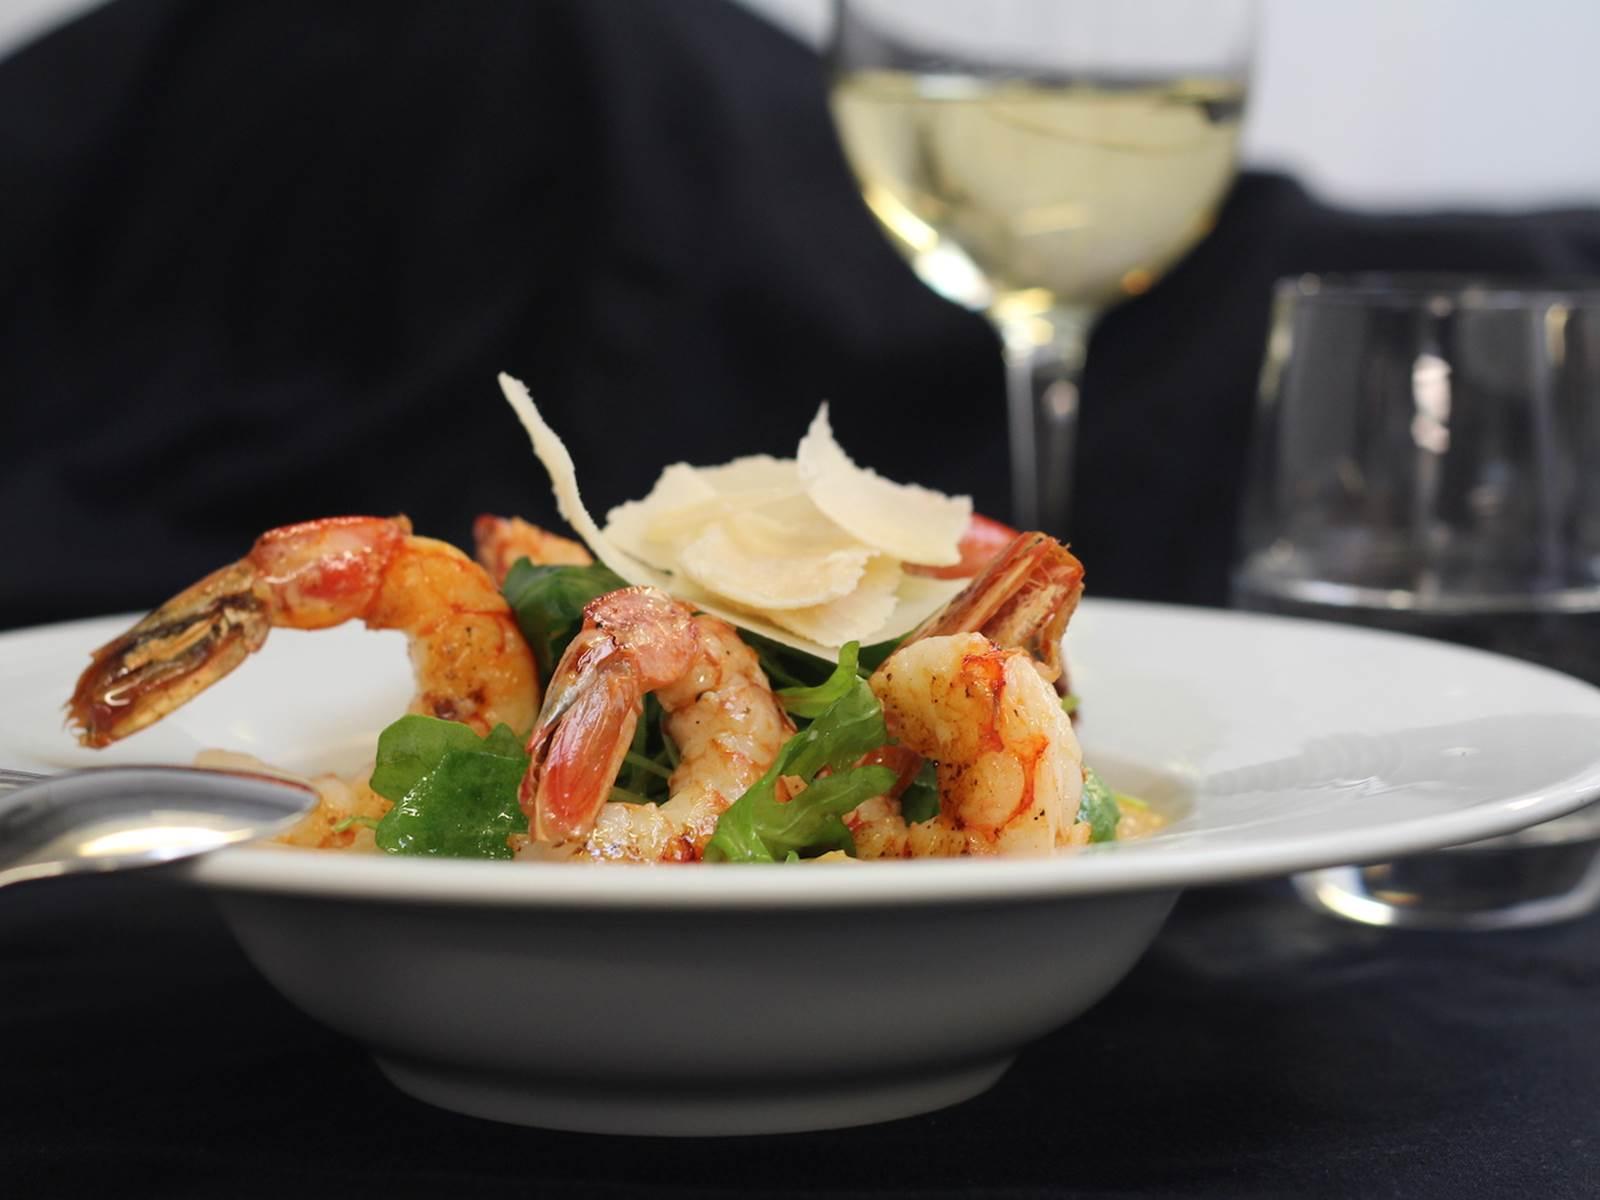 Risotto de gambas Ho^tel restaurant le Rond Point Hossegor Landes